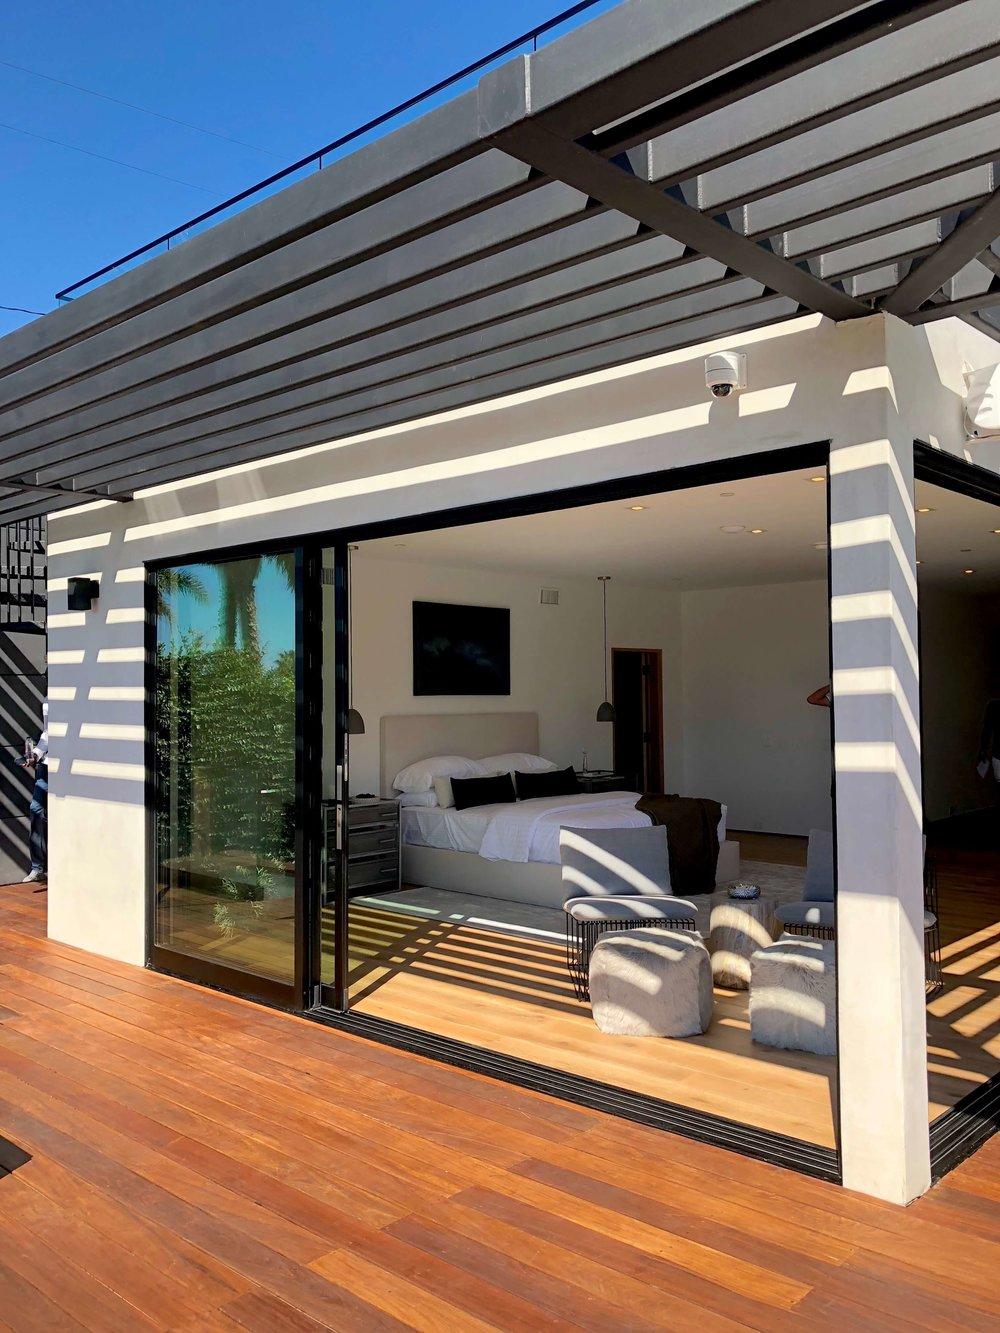 California contemporary home, Dwell on Design's Fall Home Tour, Designer: Vitus Matare #pergola #slidingdoors